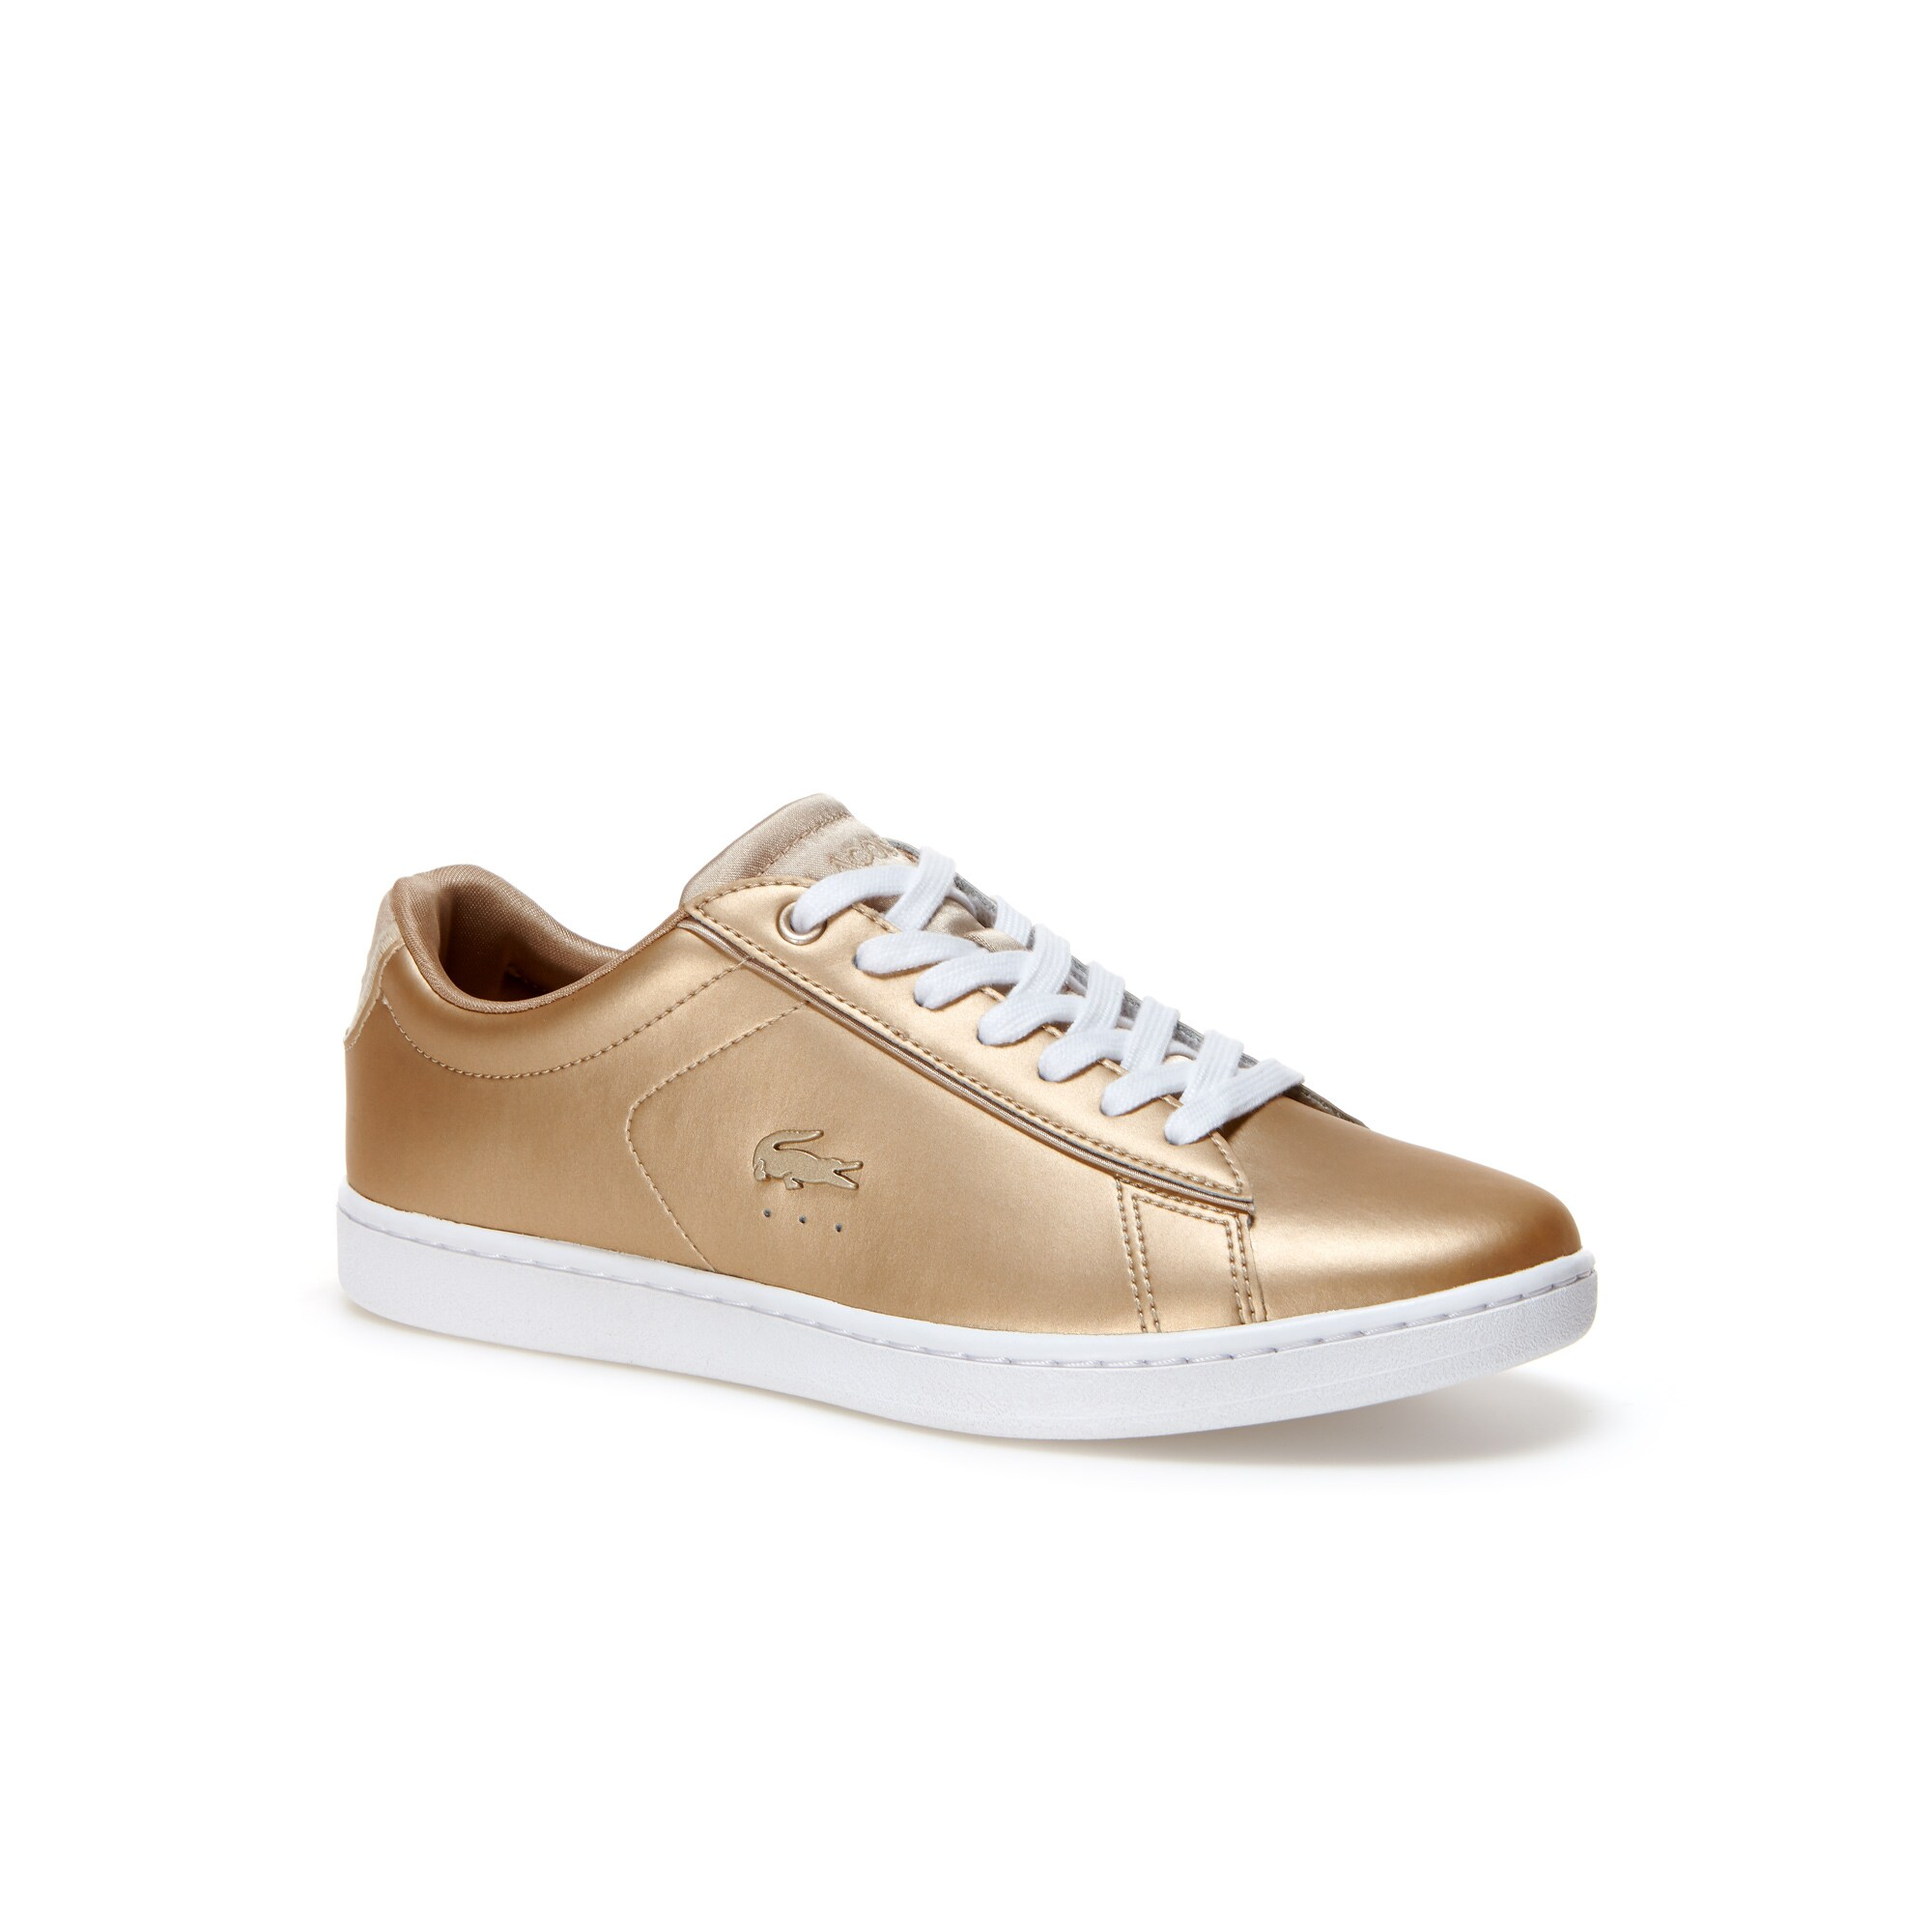 Damen-Sneakers CARNABY EVO aus Leder in Metallic-Optik